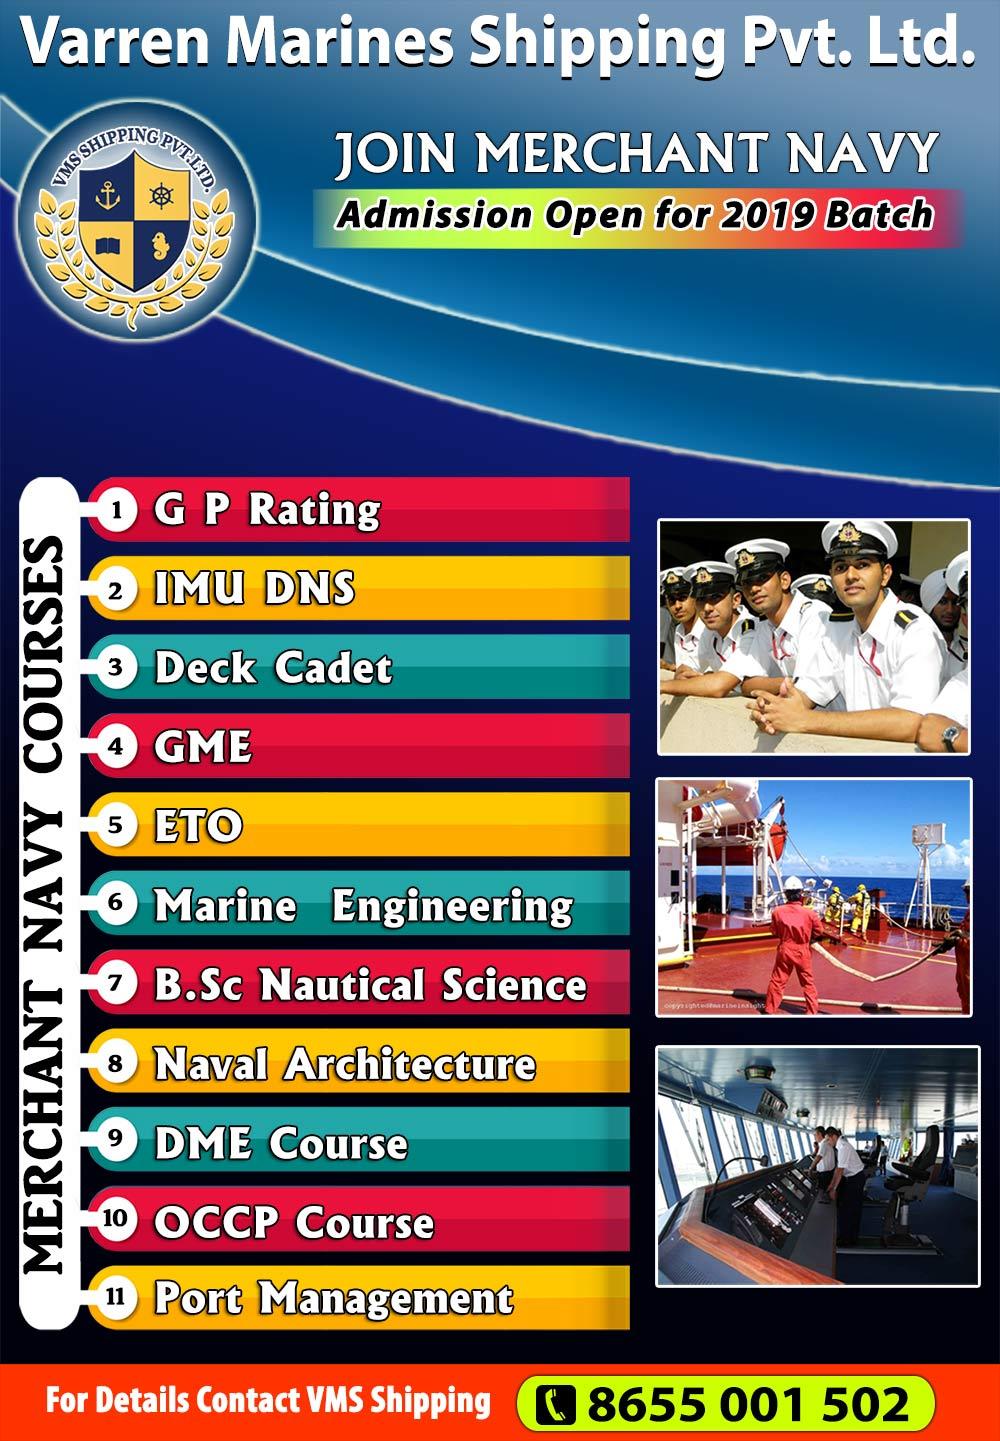 VMS_Shipping_Mumbai